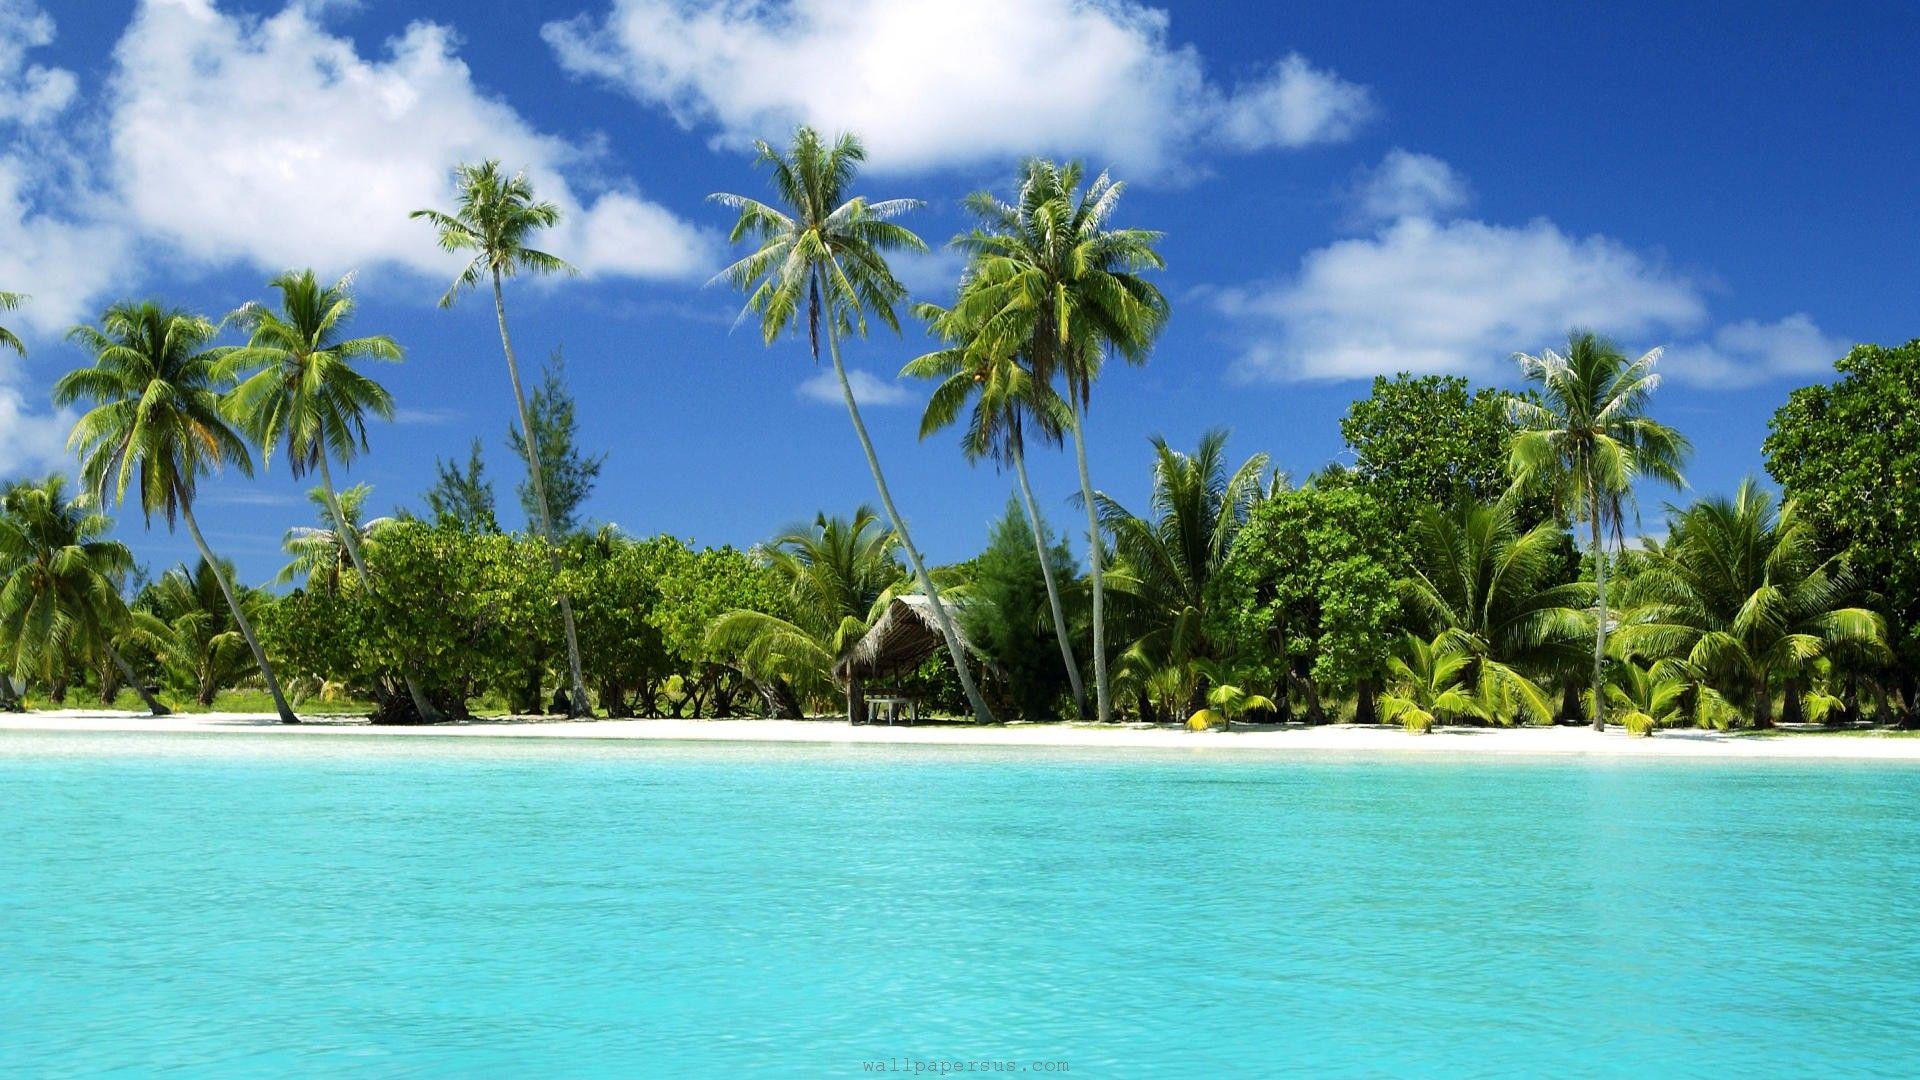 Cool Tropical Landscape Beach Scenery Beach Wallpaper Tropical Island Beach